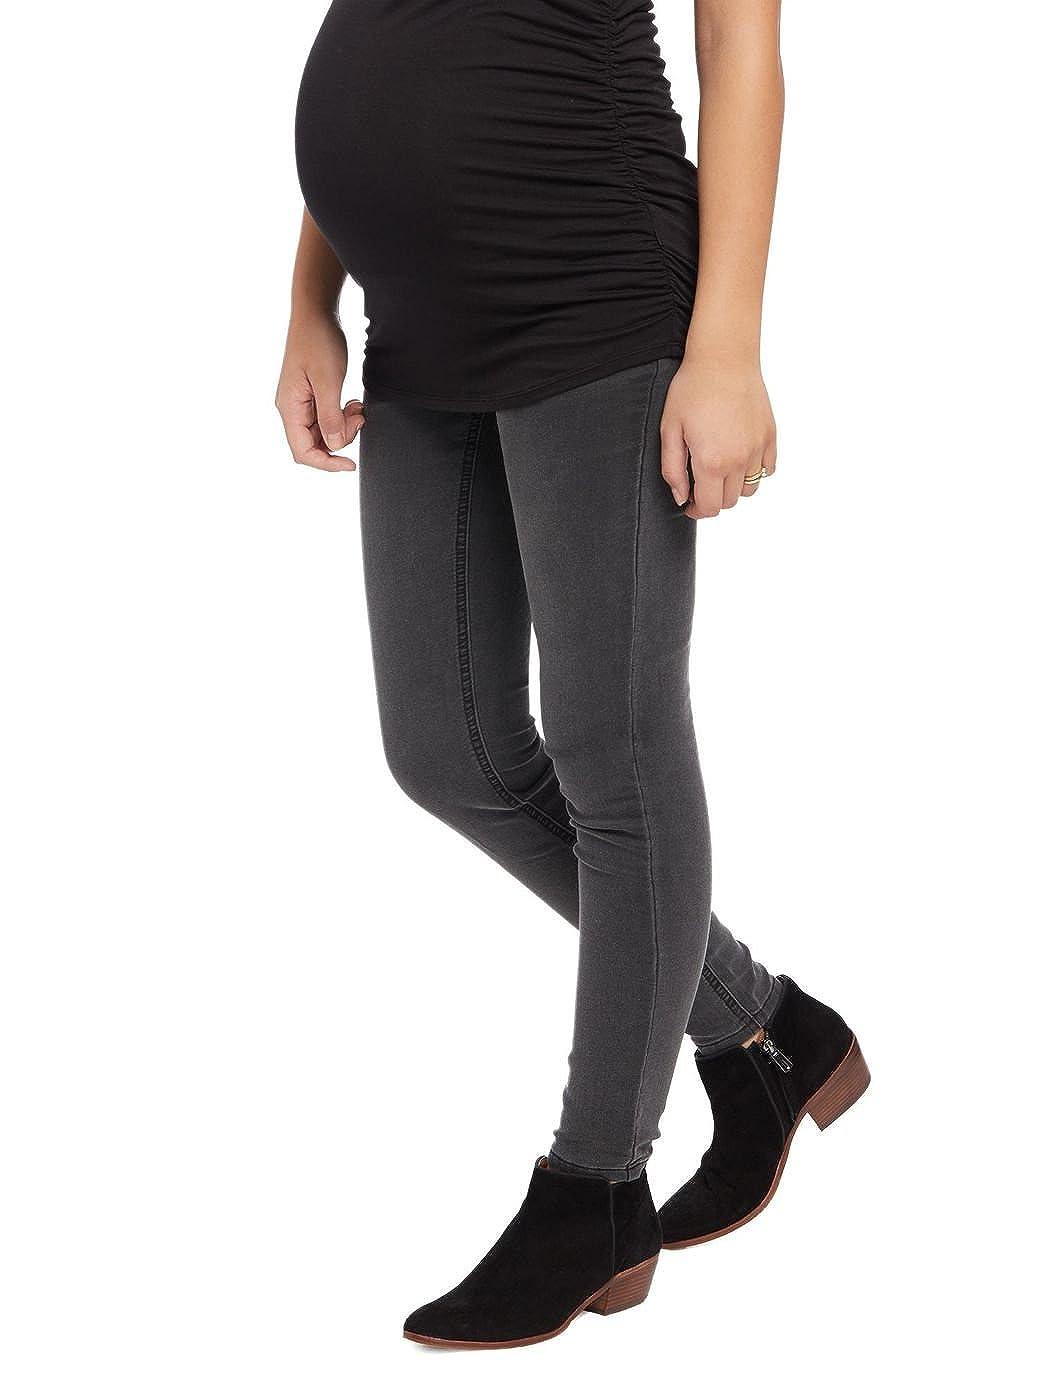 Belly Envy Space Gray Maternity Skinny Jeans Denim Pants